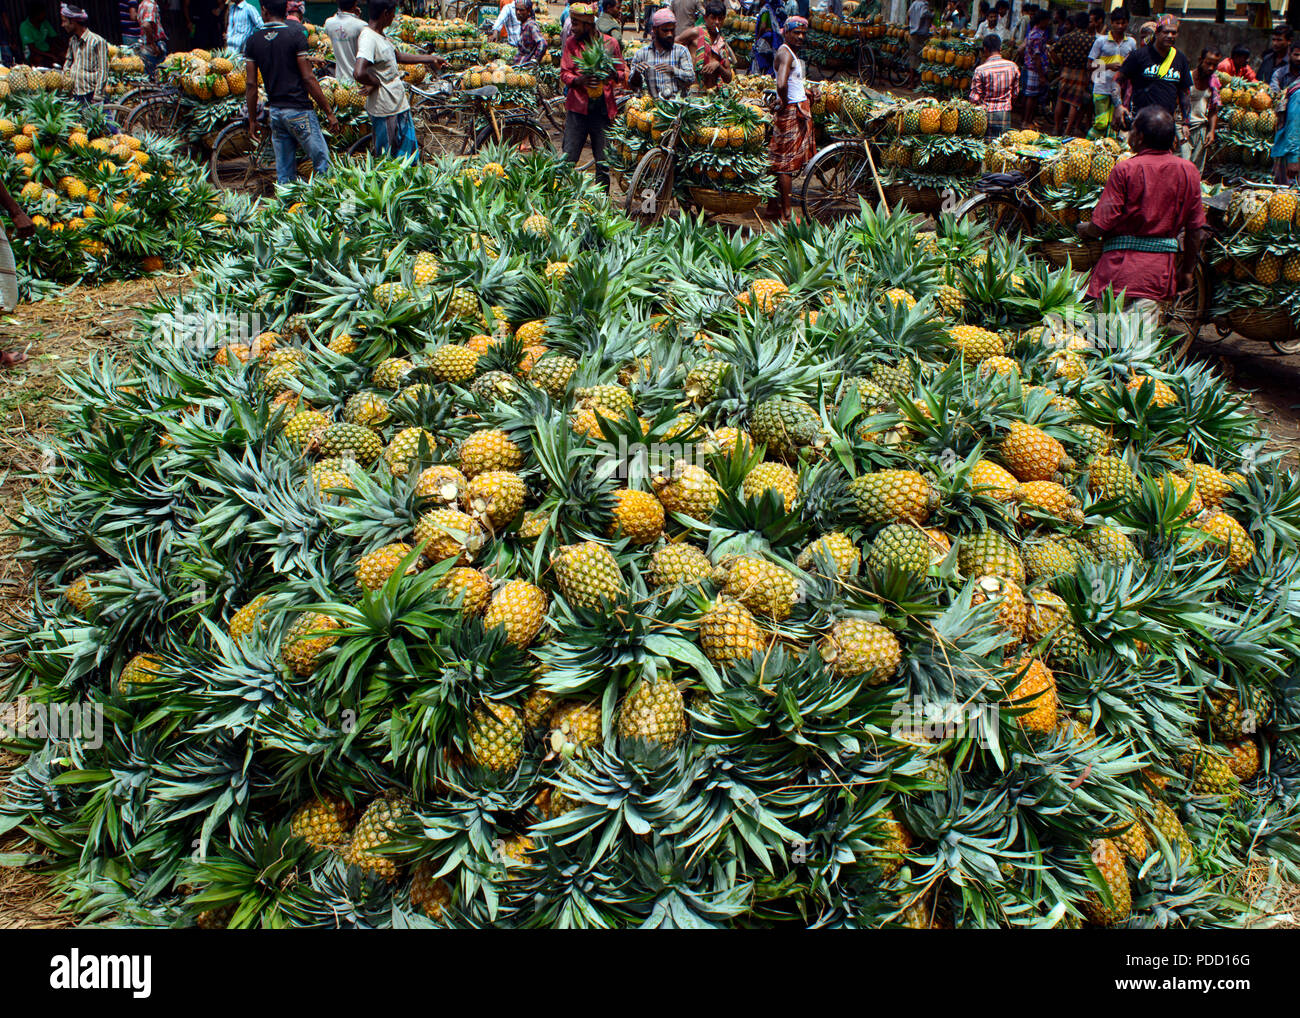 pineapple - Stock Image